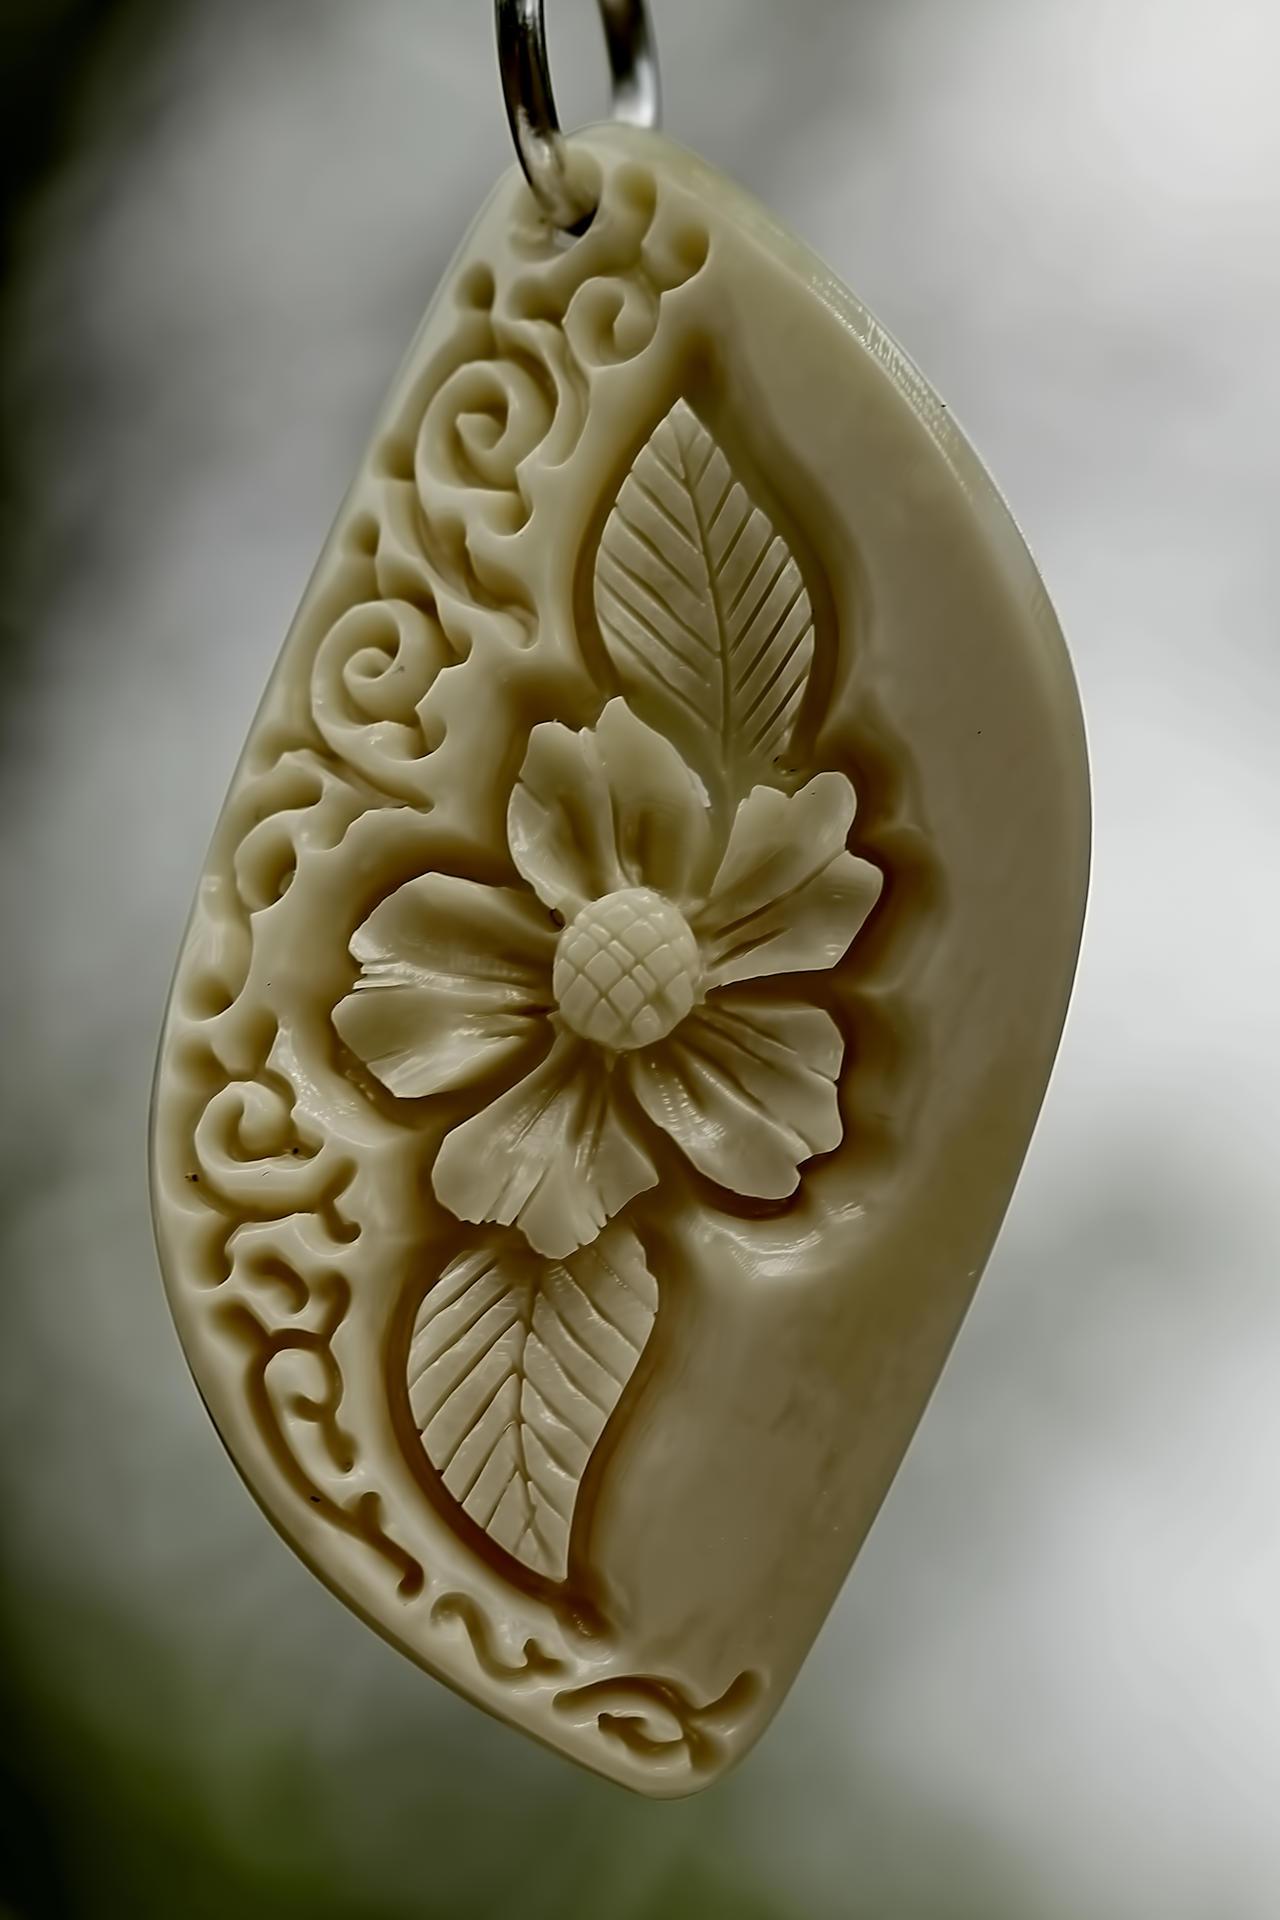 pendant 10 - bone carving by manuroartis